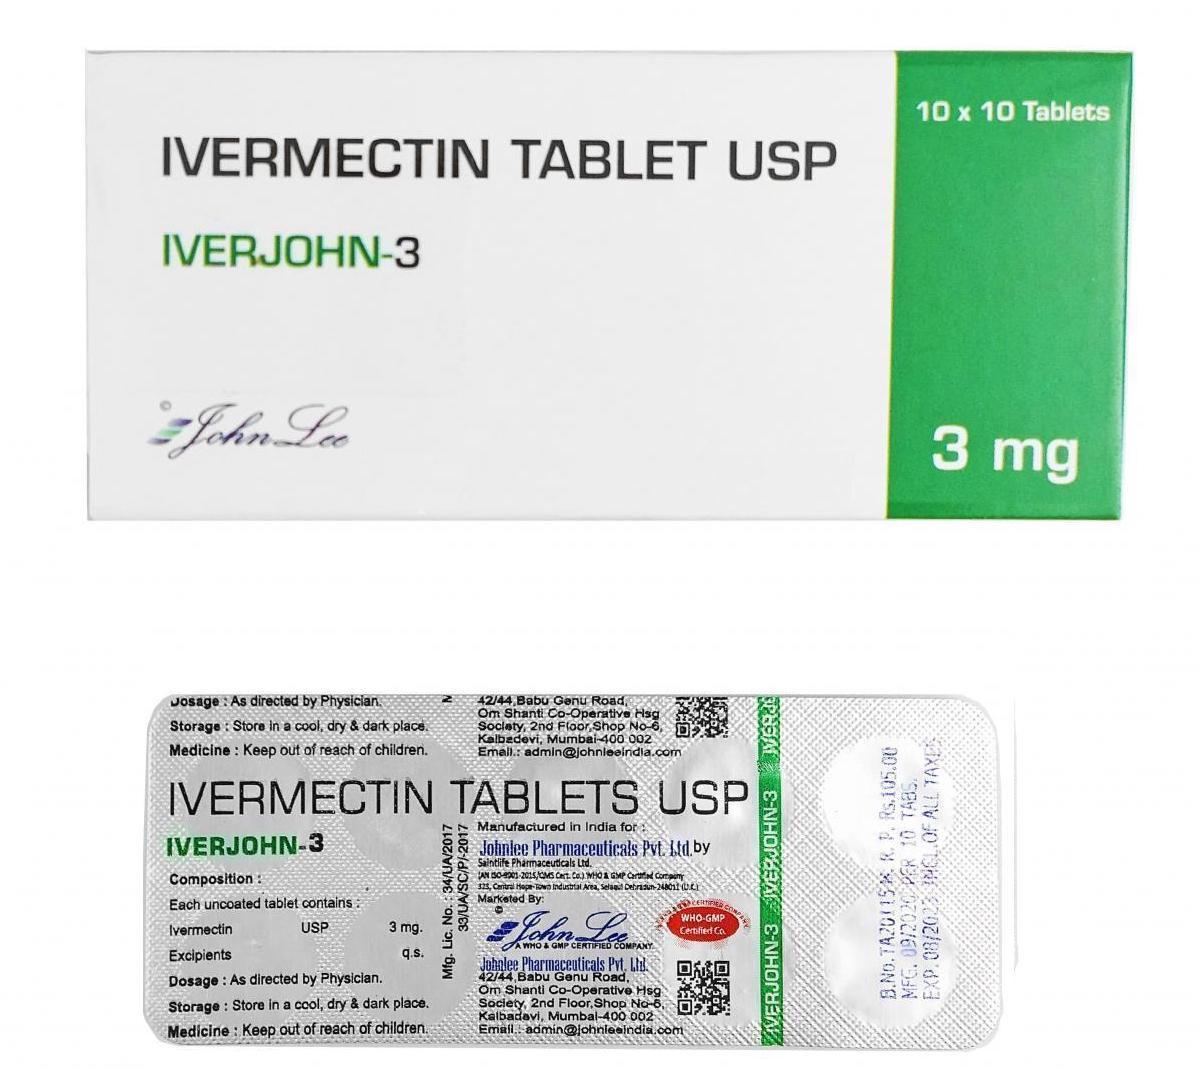 Ivermectin USP 3MG